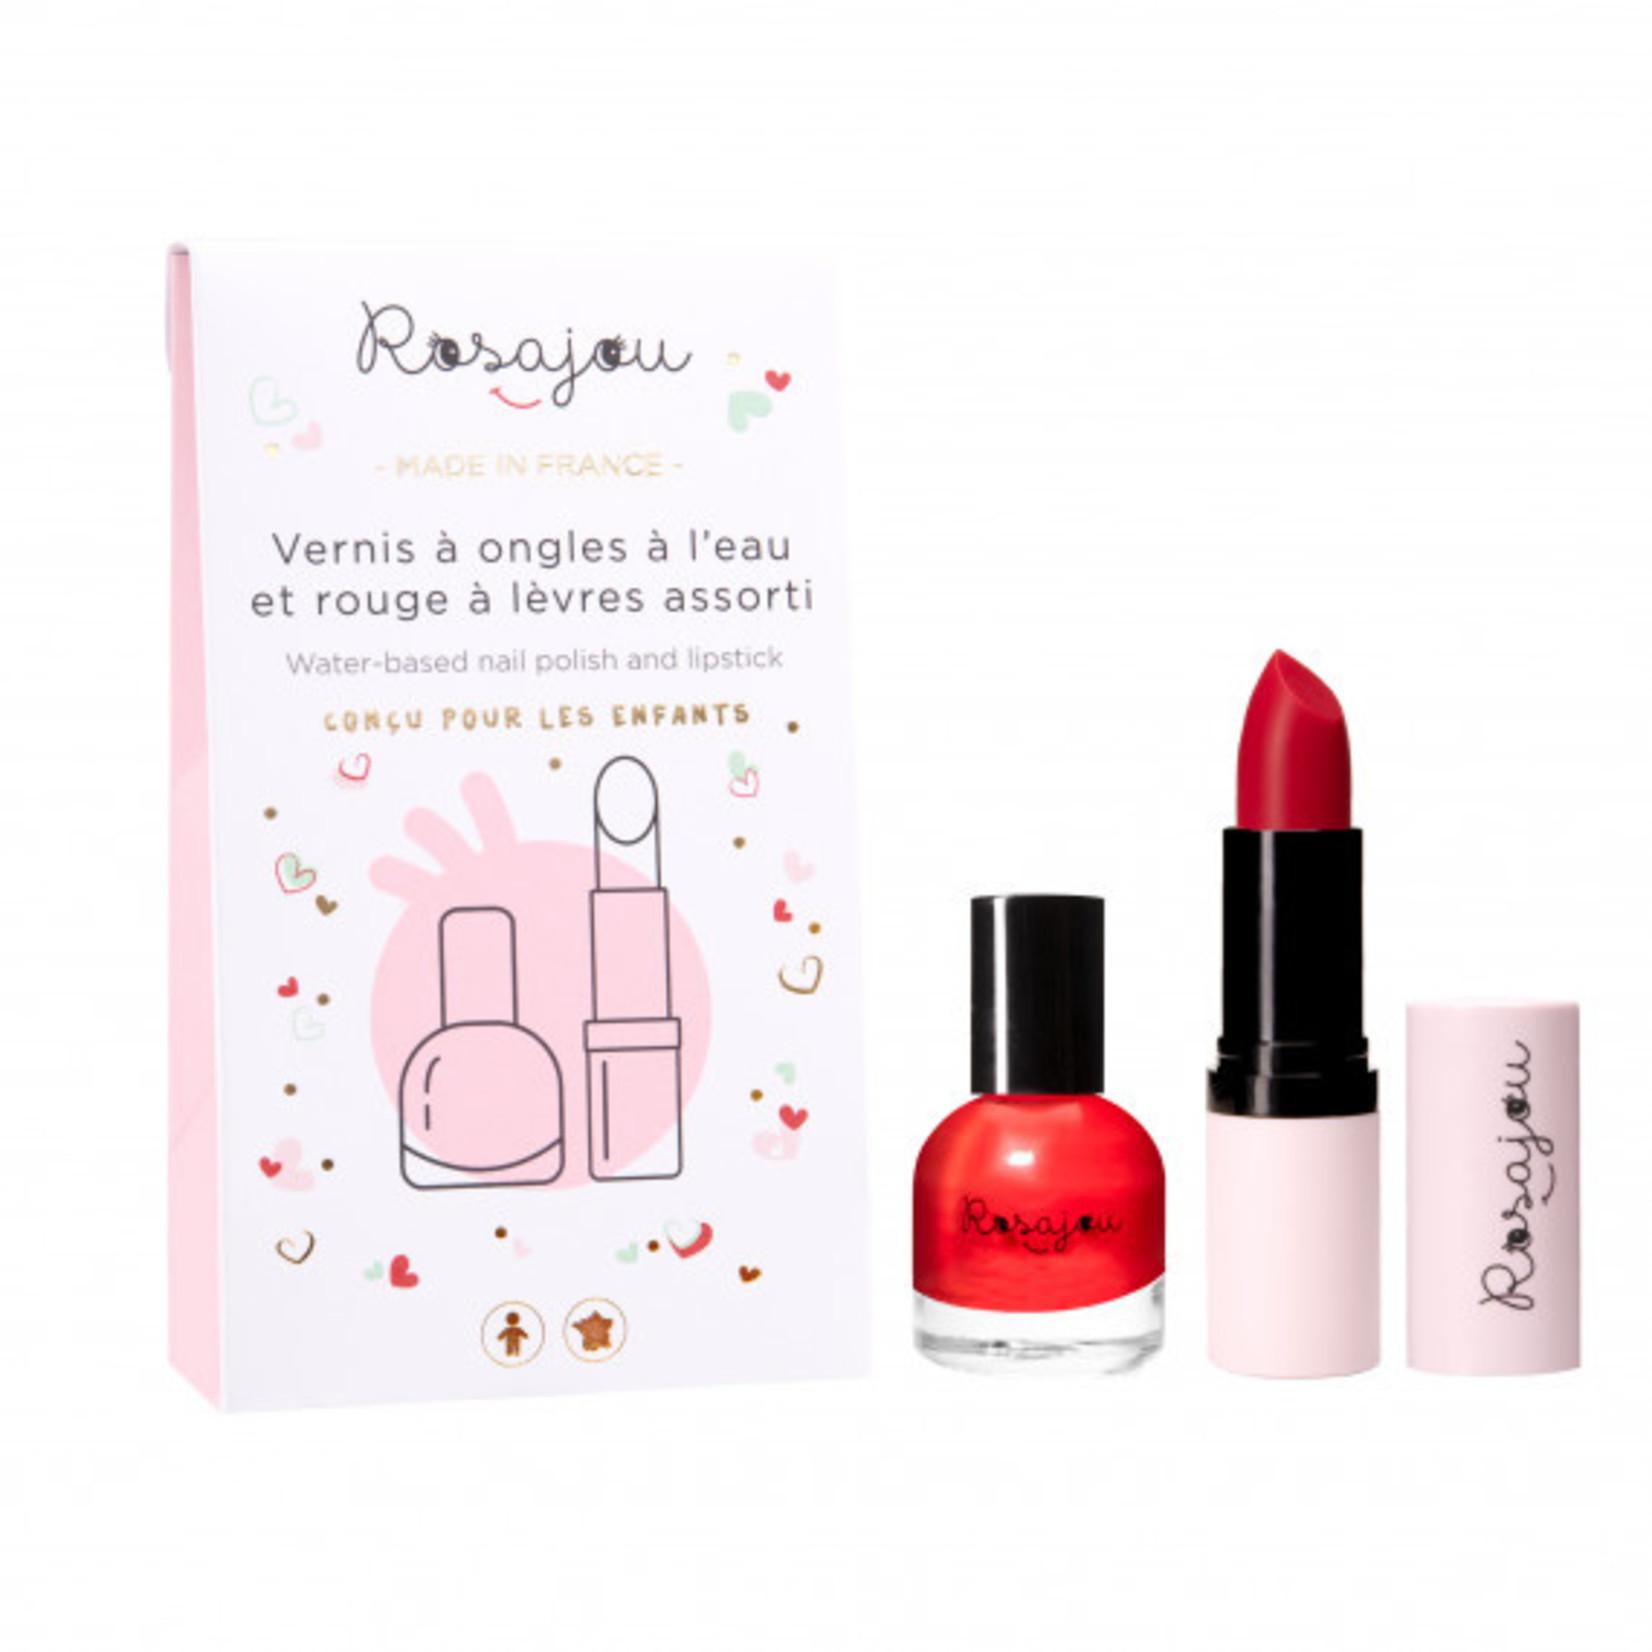 Rosajou Rosajou Nagellak en lipstick Madame speciaal voor kinderen